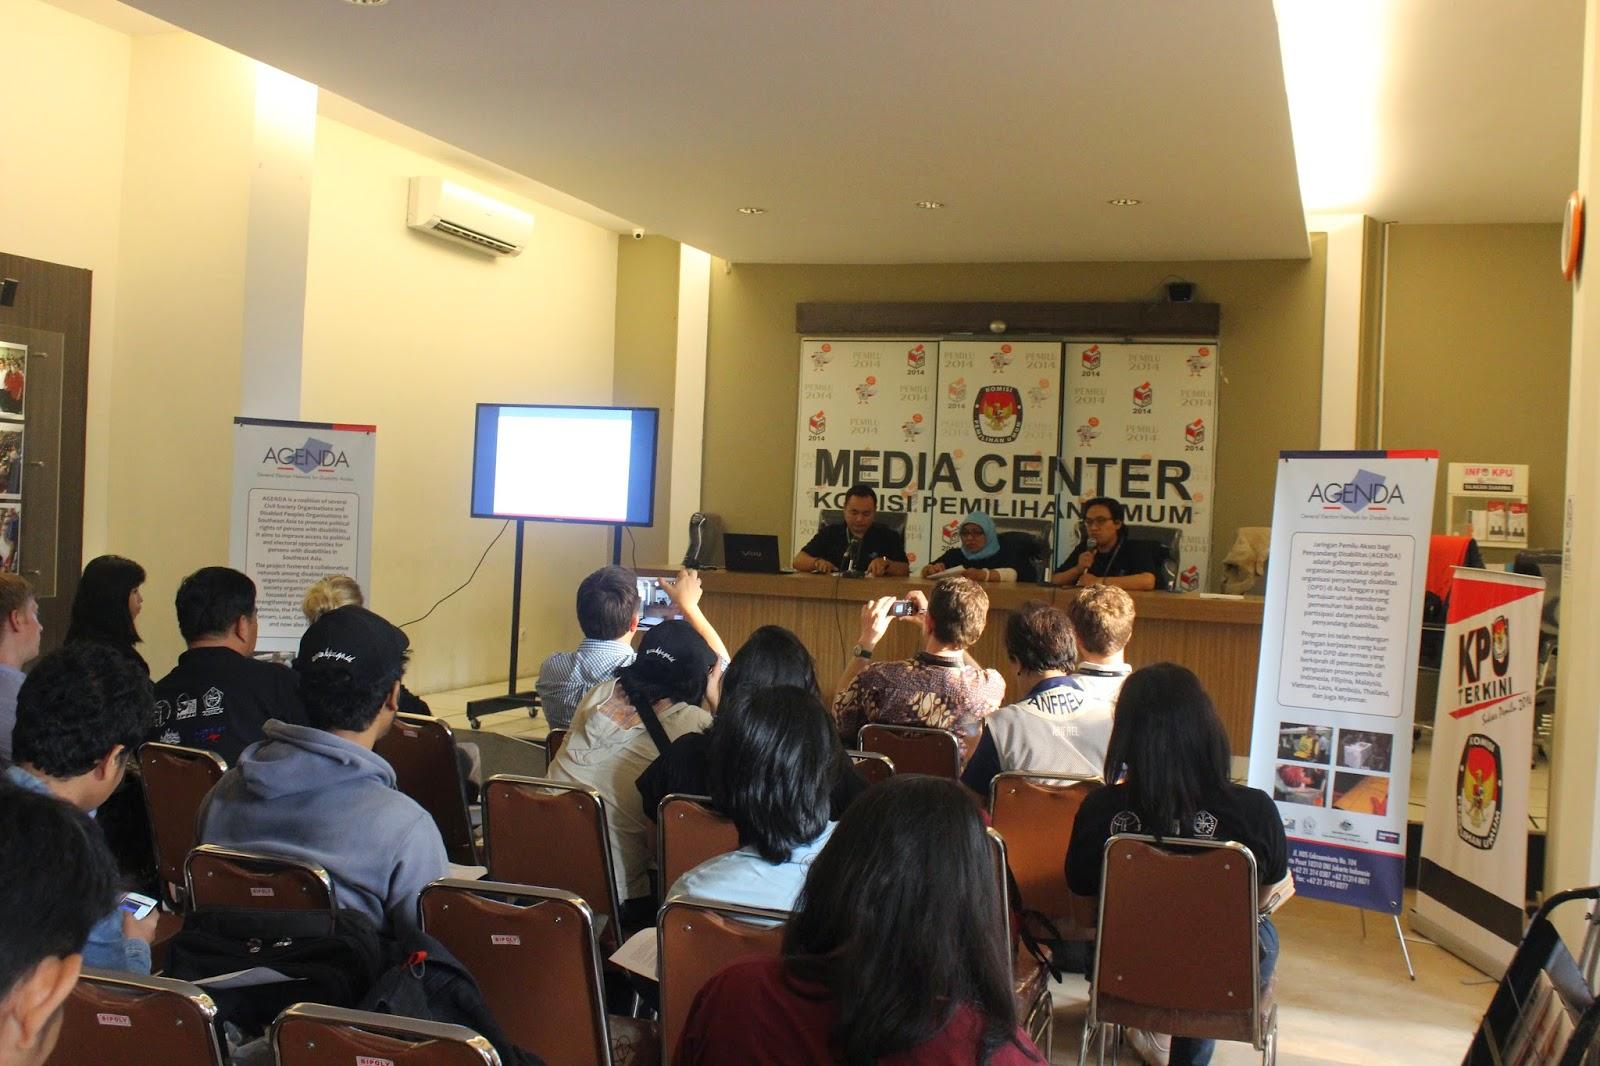 AGENDA PressConference at KPU Media Center  9 July 2014